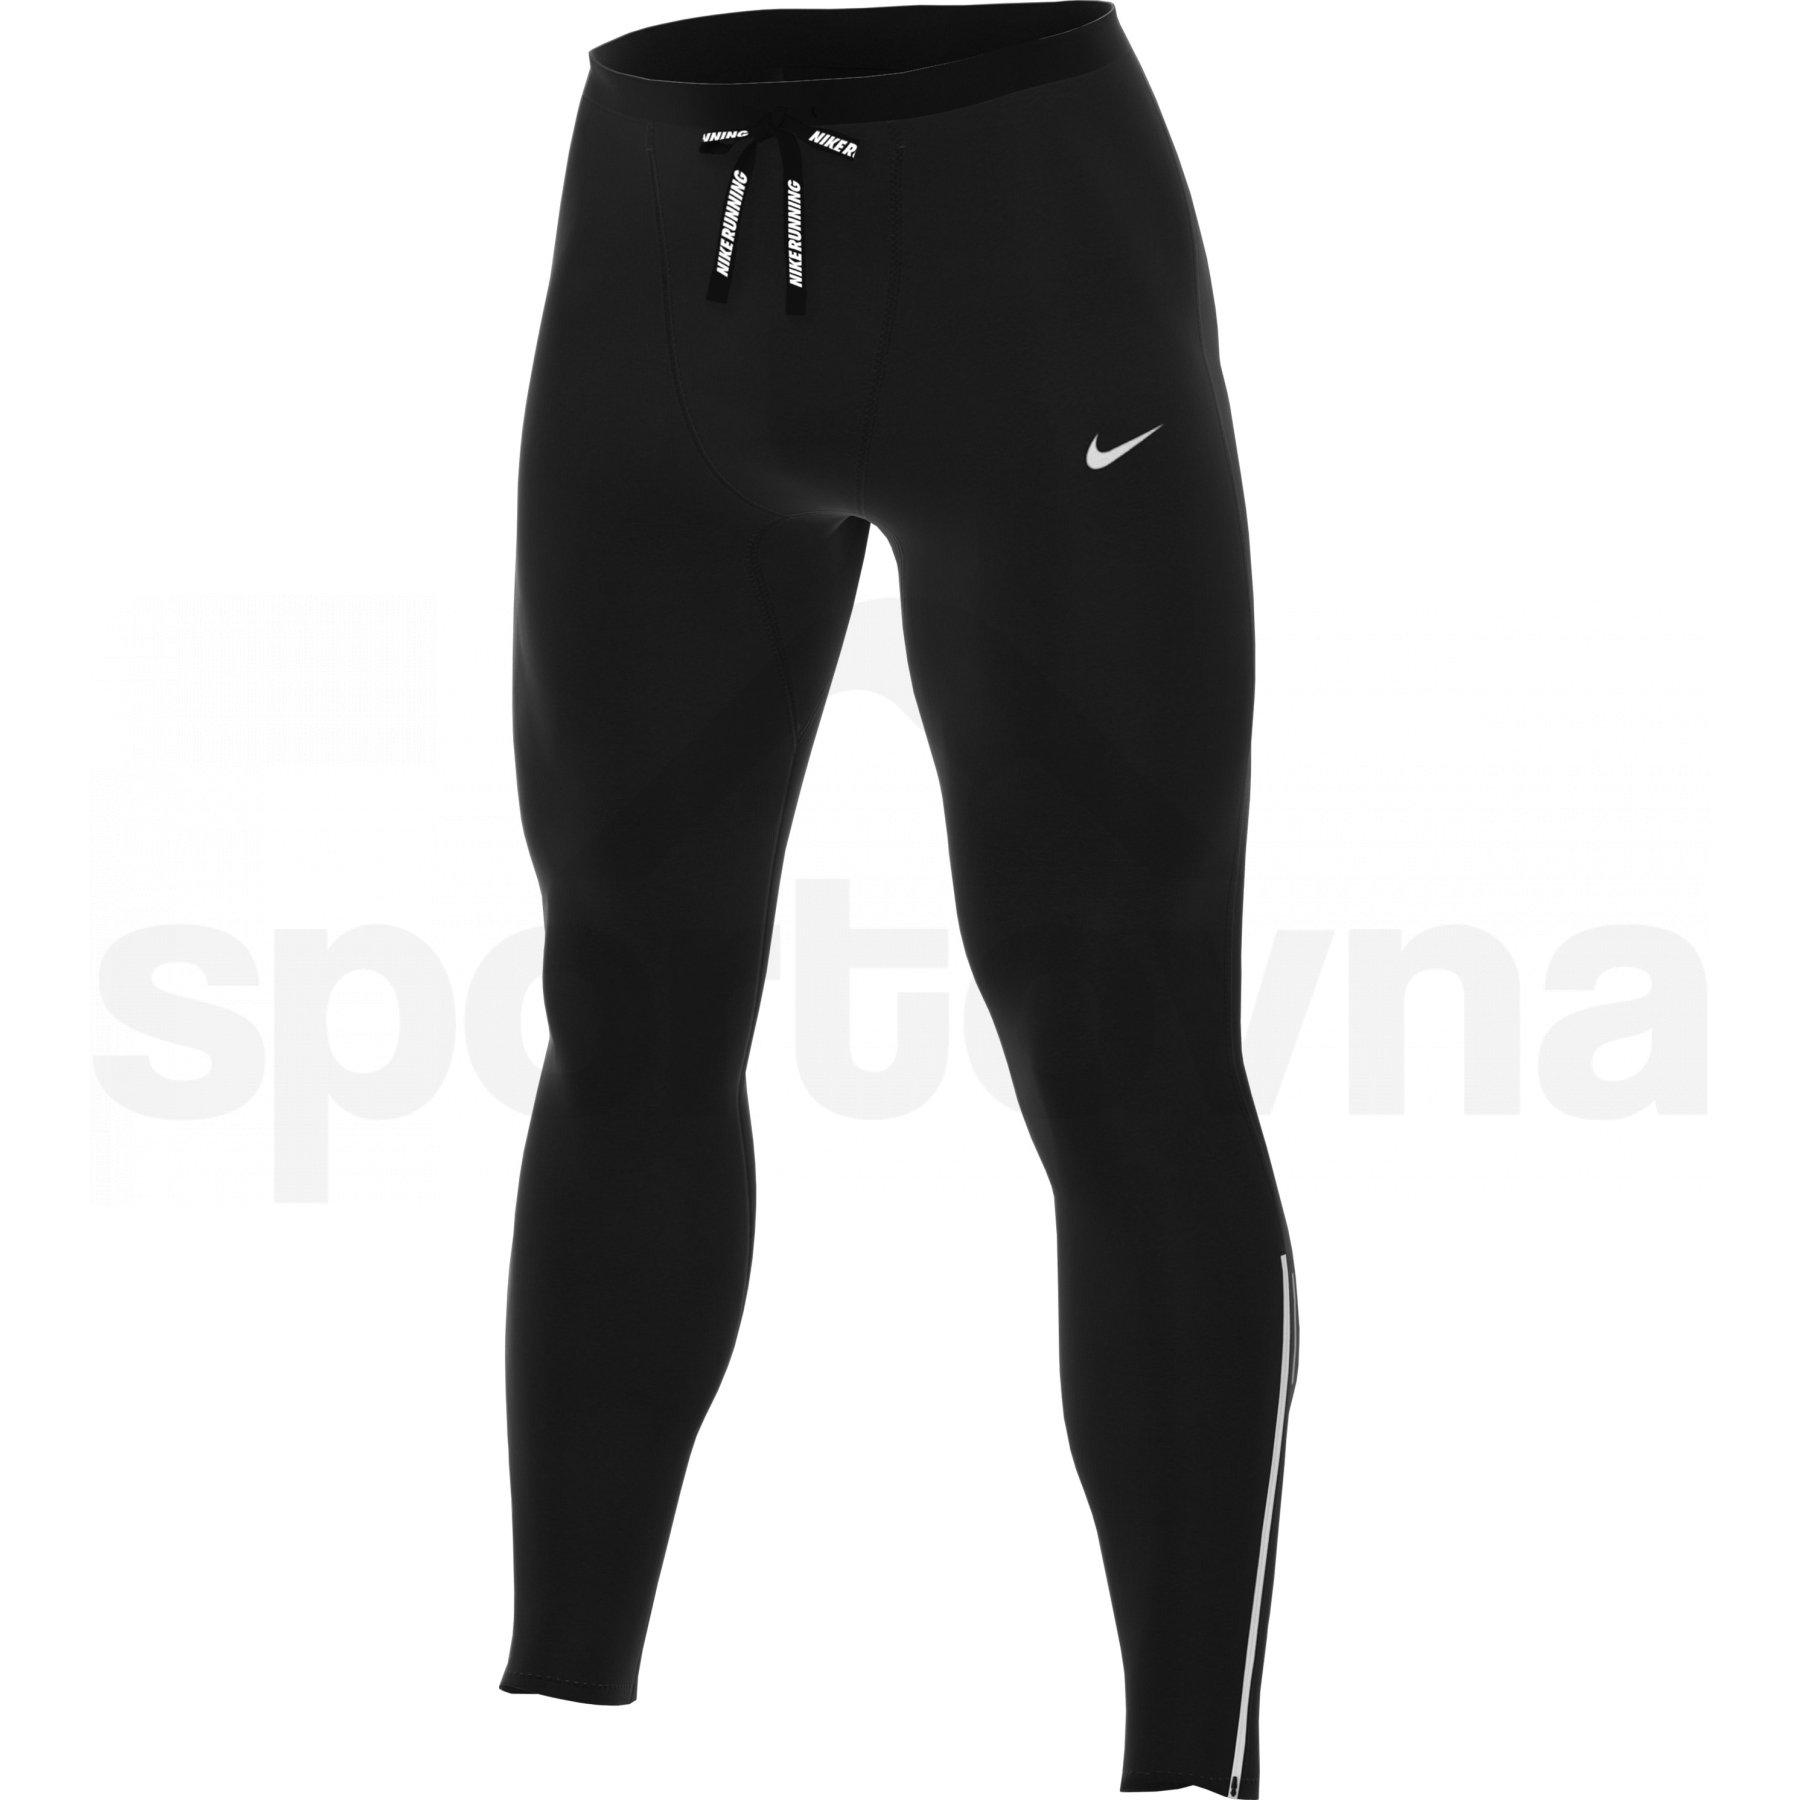 nike-dri-fit-essential-mens-running-tights-black-reflective-silver-cz8830-010-1-918172